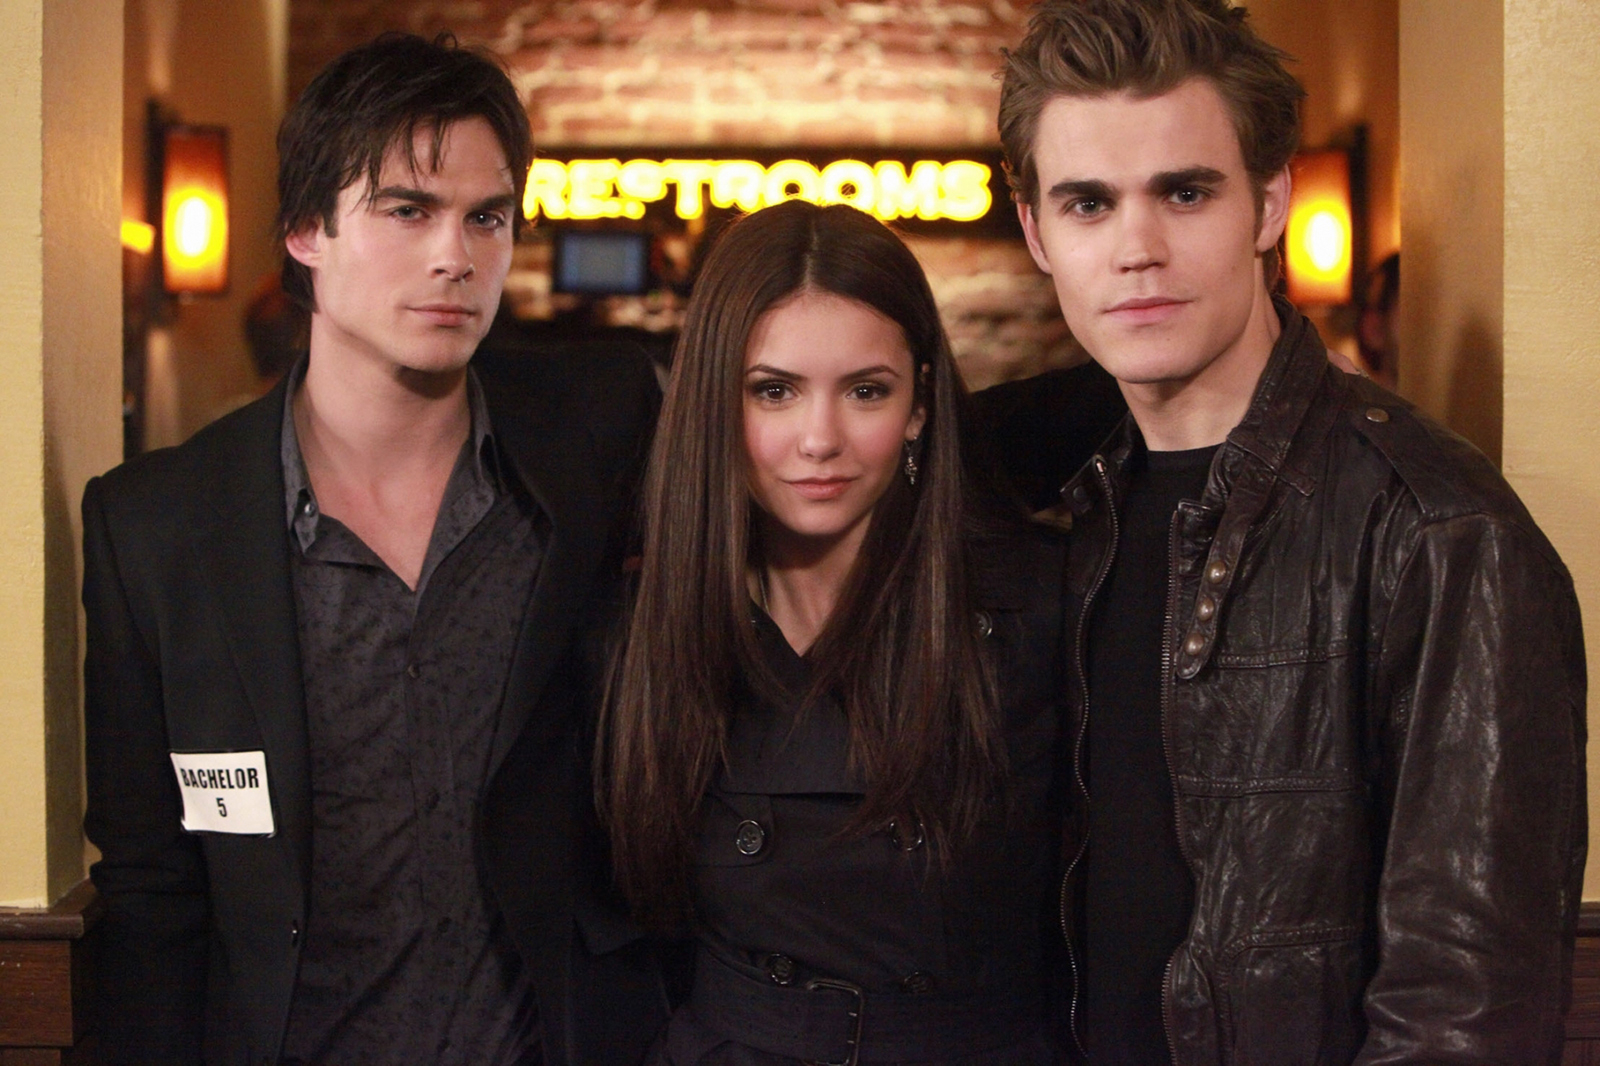 Vampire Diaries Ian Somerhalder, Nina Dobrev and Paul Wesley